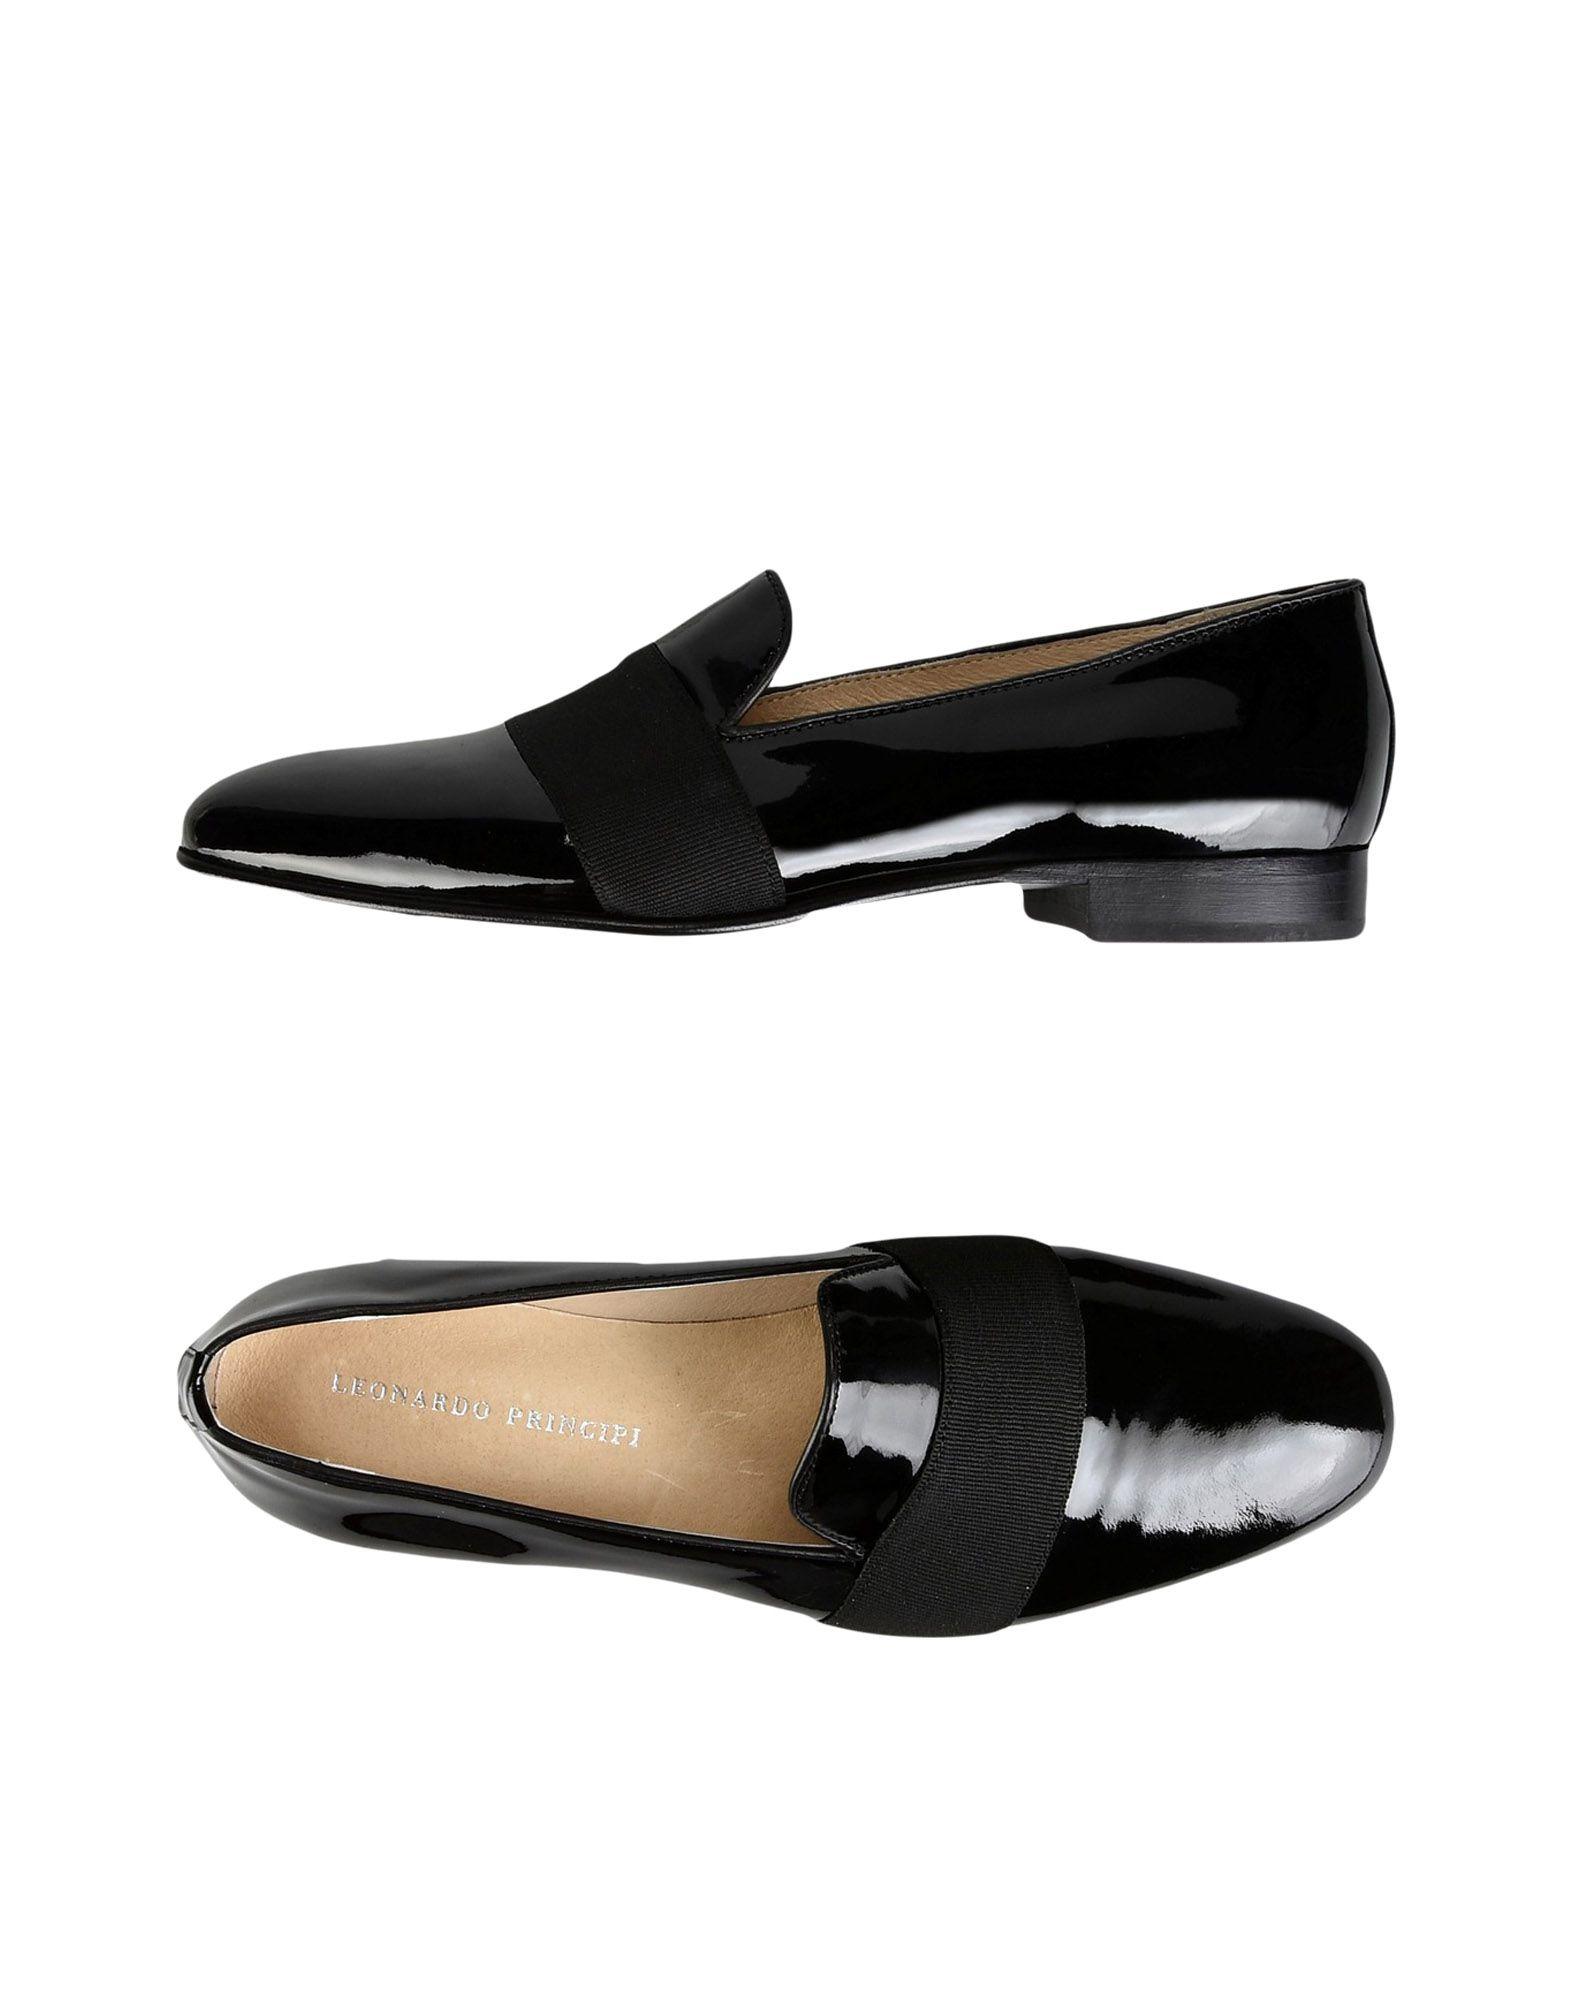 Leonardo Principi Mokassins Damen beliebte  11222169VV Gute Qualität beliebte Damen Schuhe 2c41fd